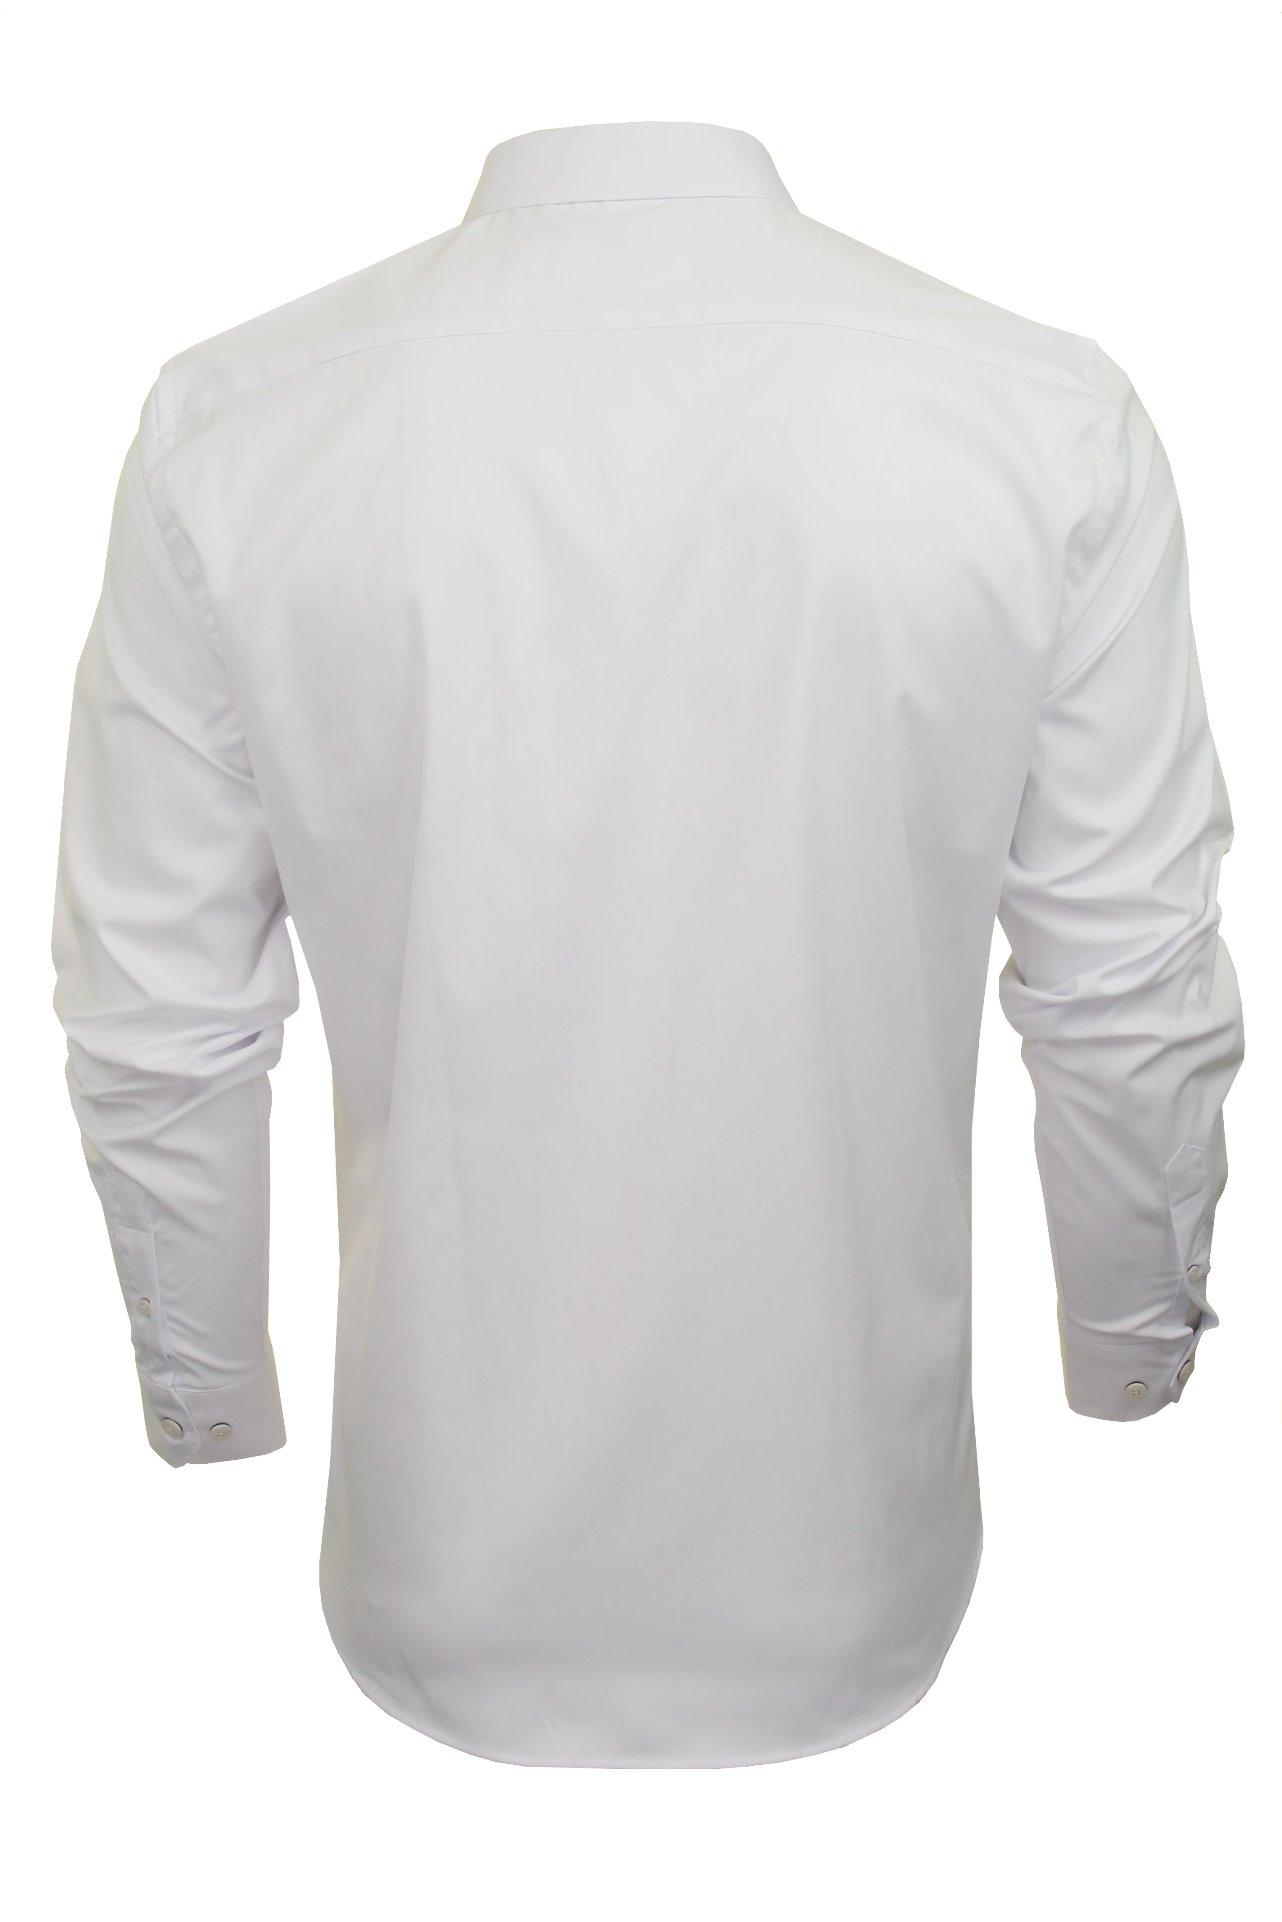 Xact-Mens-Long-Sleeved-Poplin-Stretch-Shirt-Slim-Fit miniatuur 14